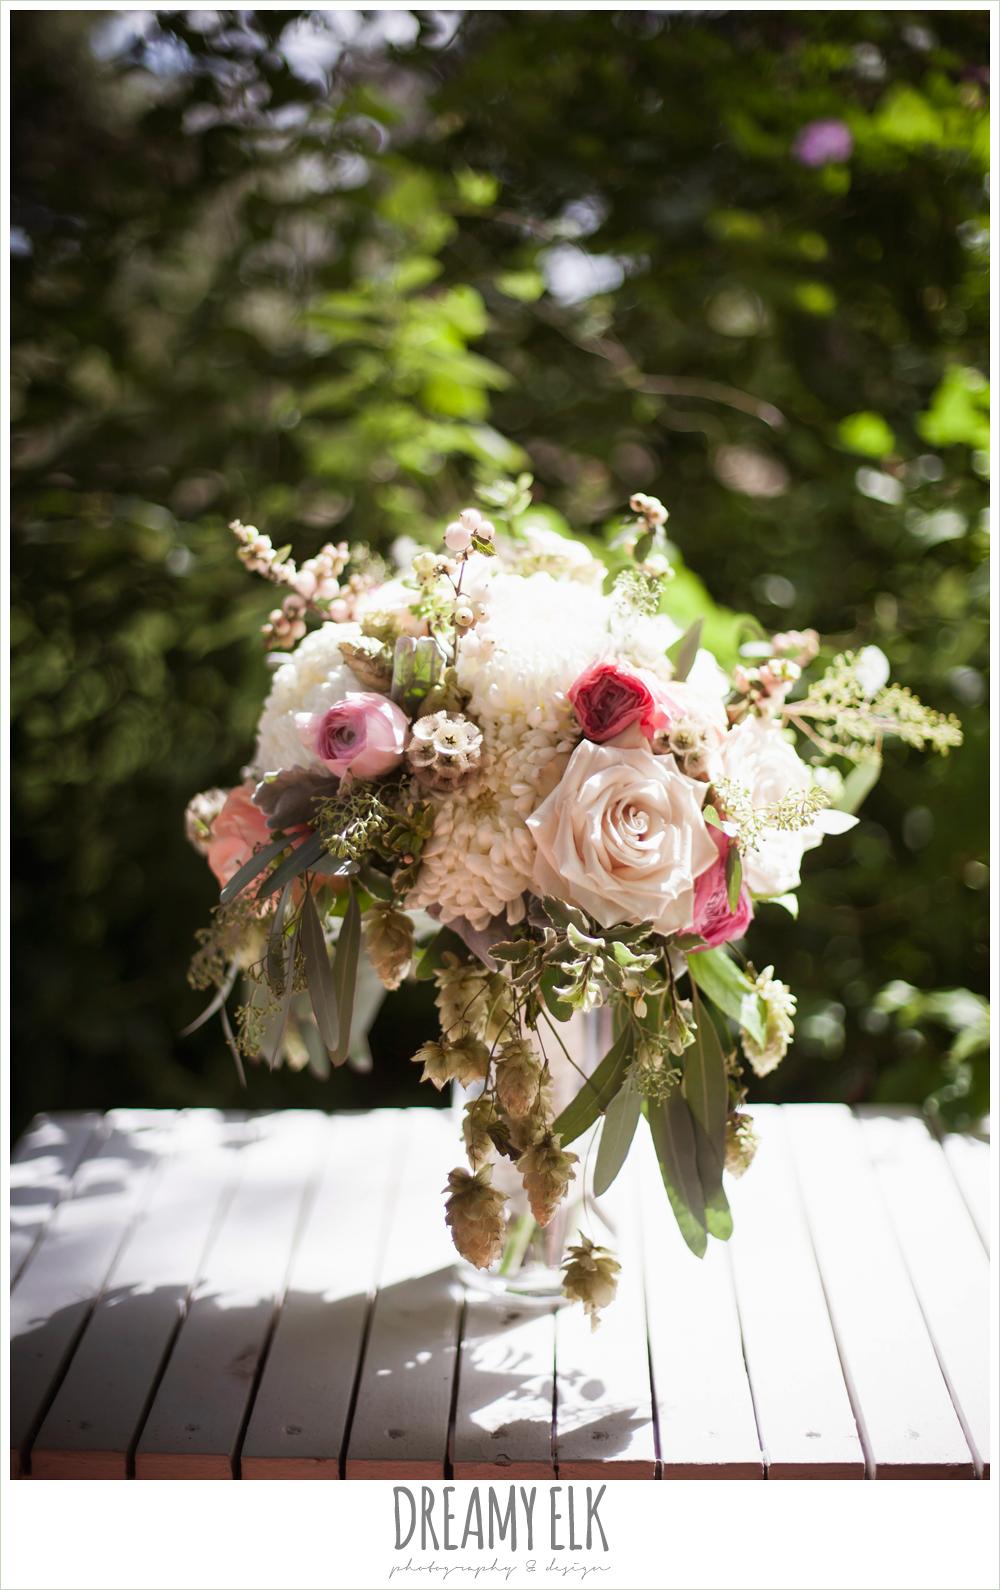 blush neutral unique wedding bouquet, bouquets of austin, the winfield inn, wedding photo {dreamy elk photography and design}